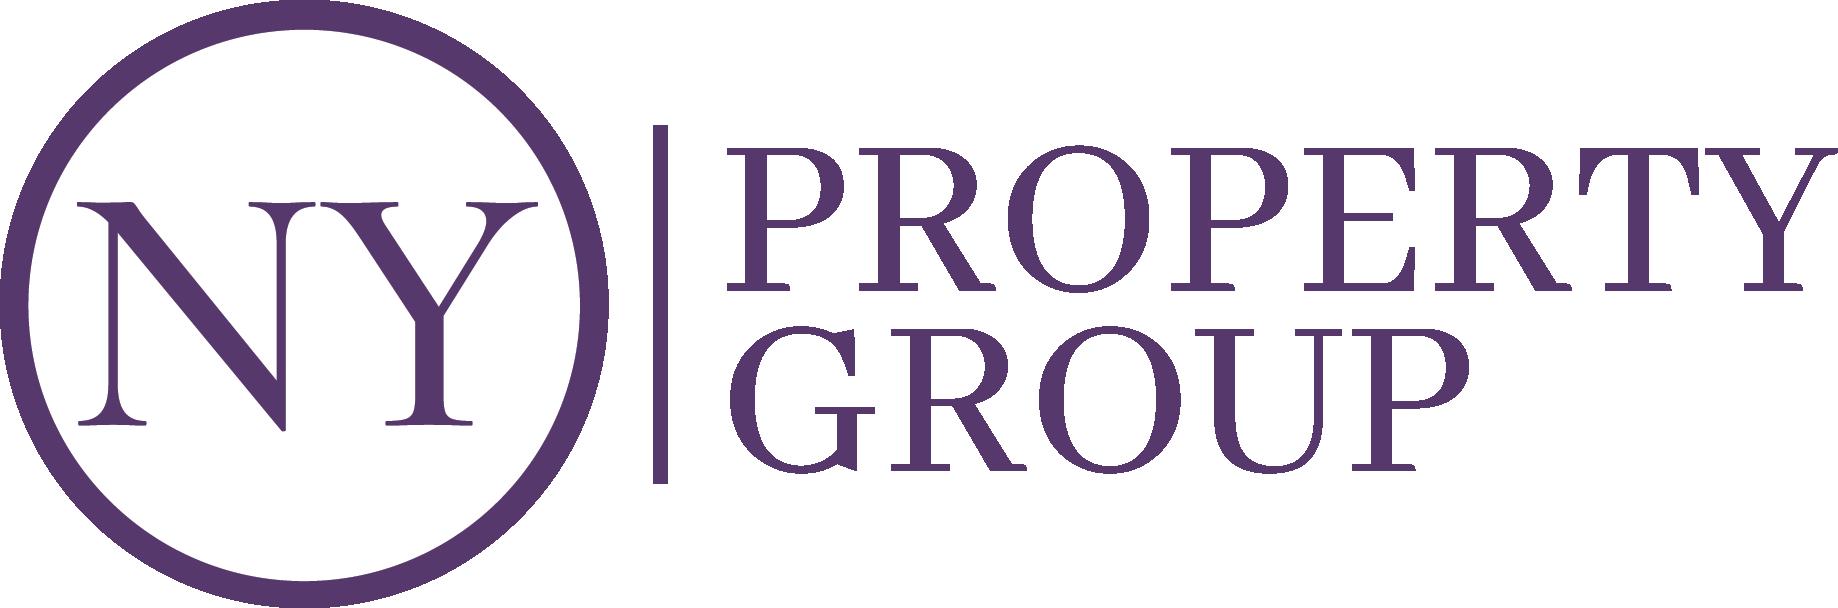 NY Property Group